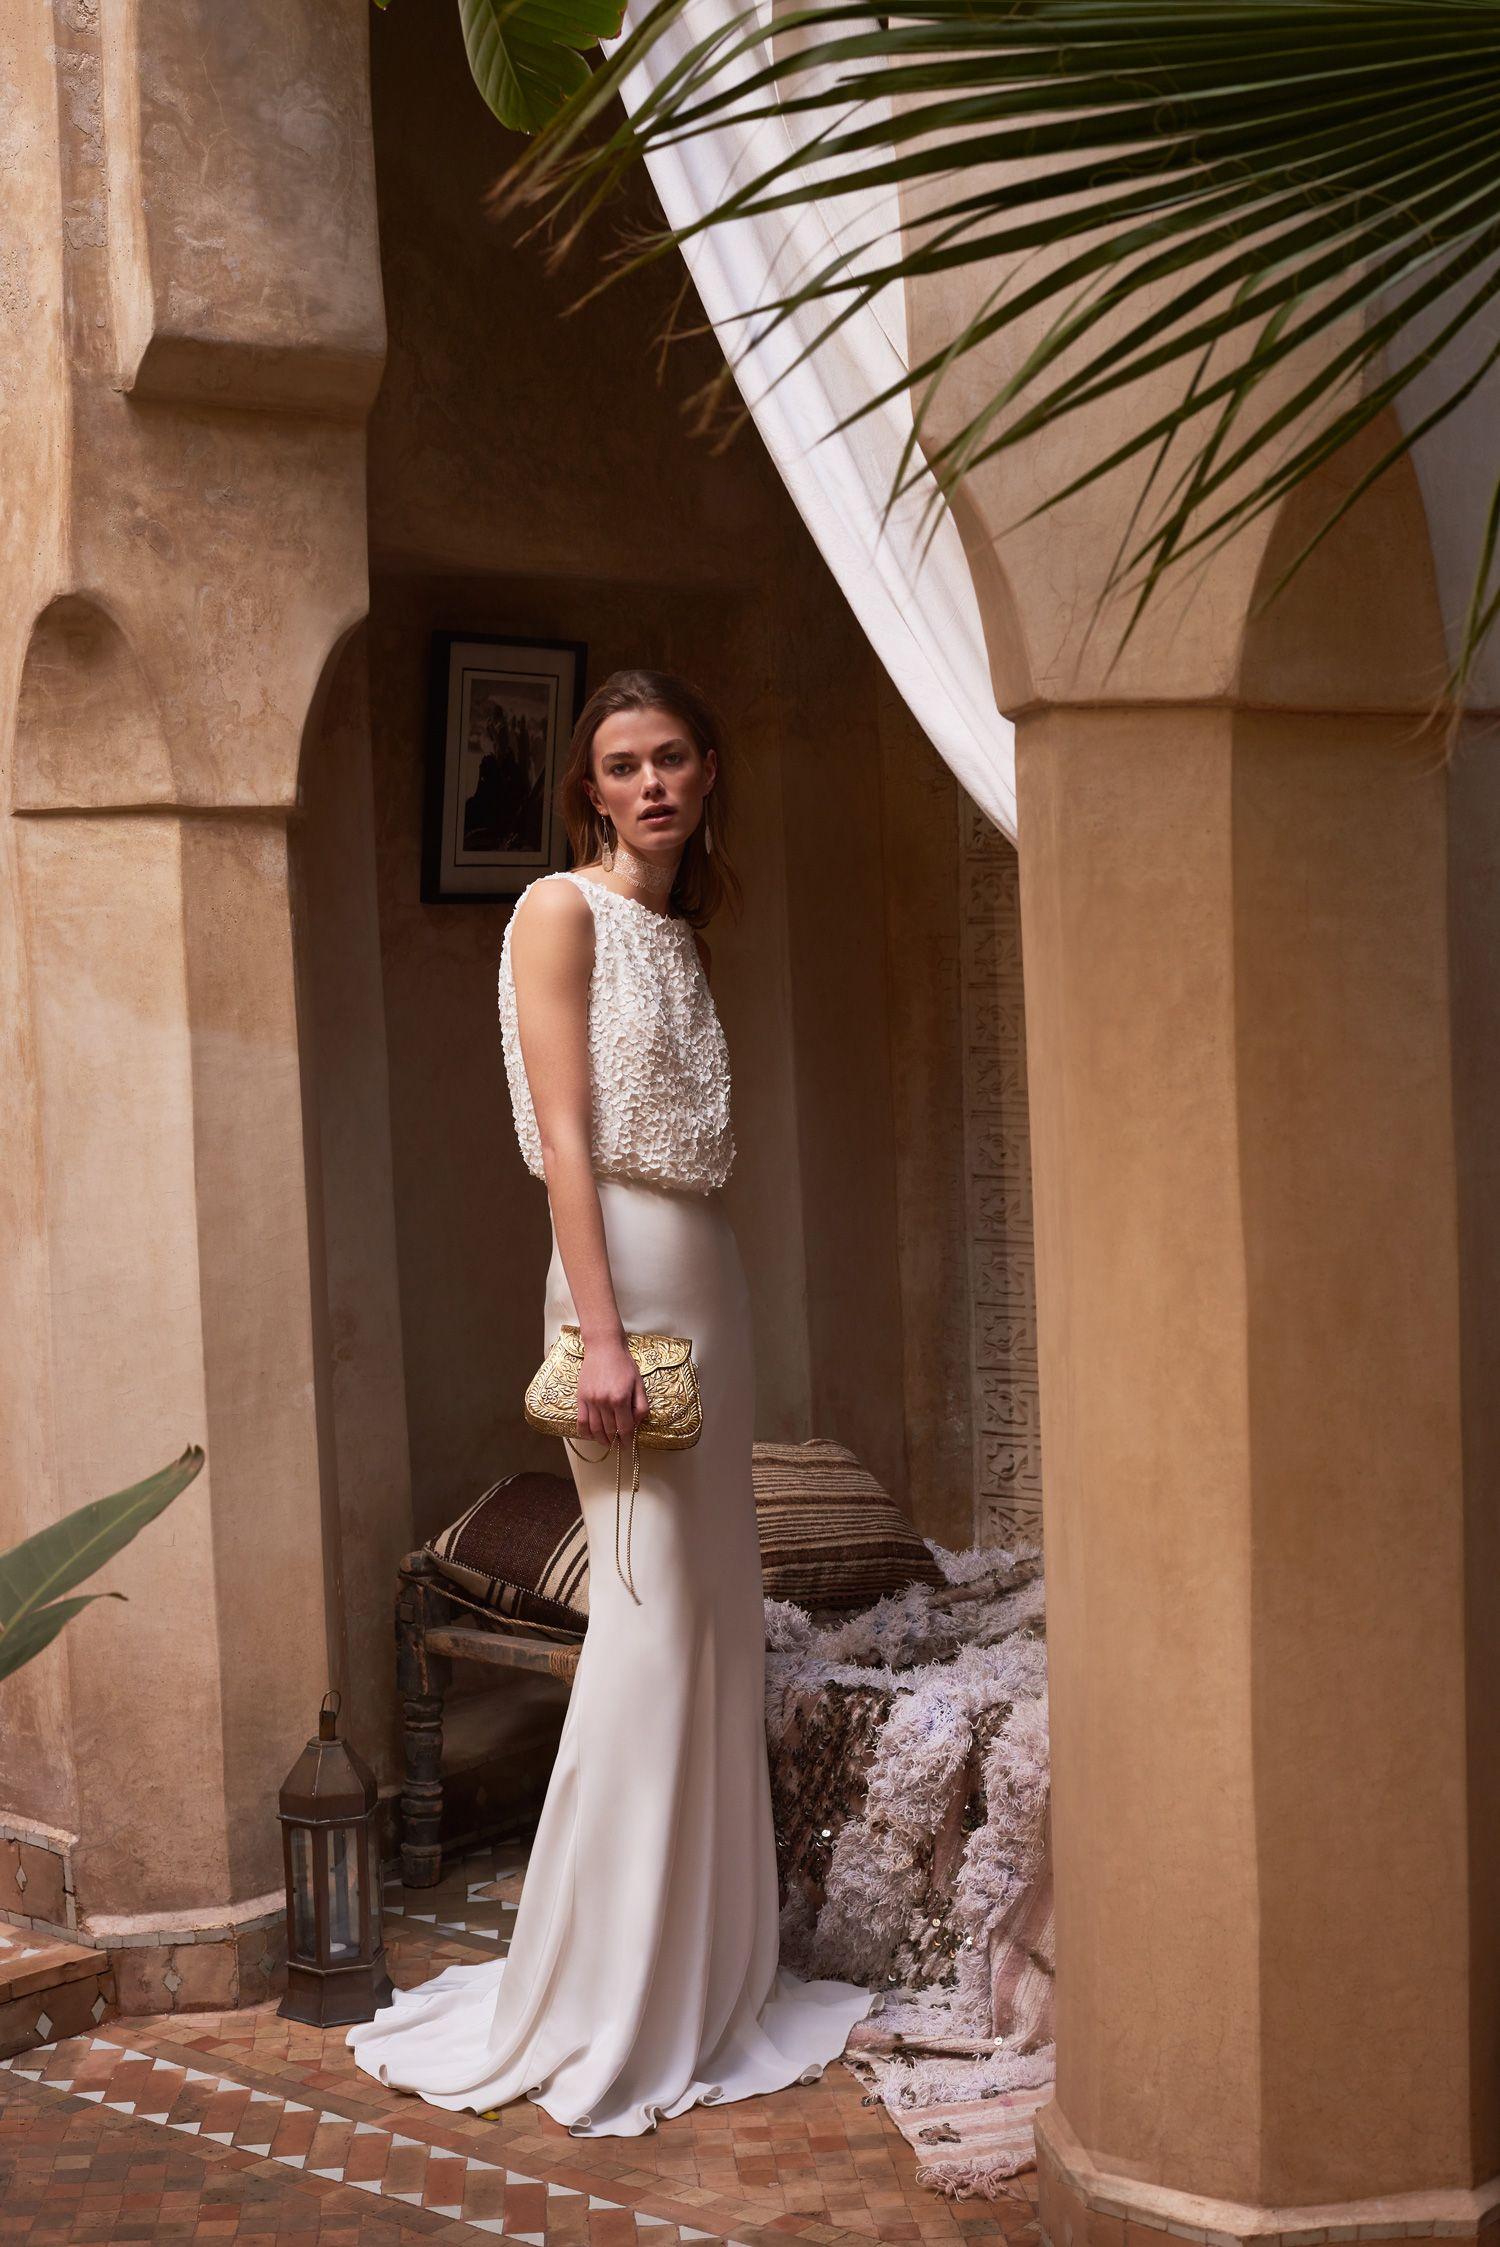 Sleek, Boho-Chic Bridal Gowns for Modern Brides | Bridal gowns ...